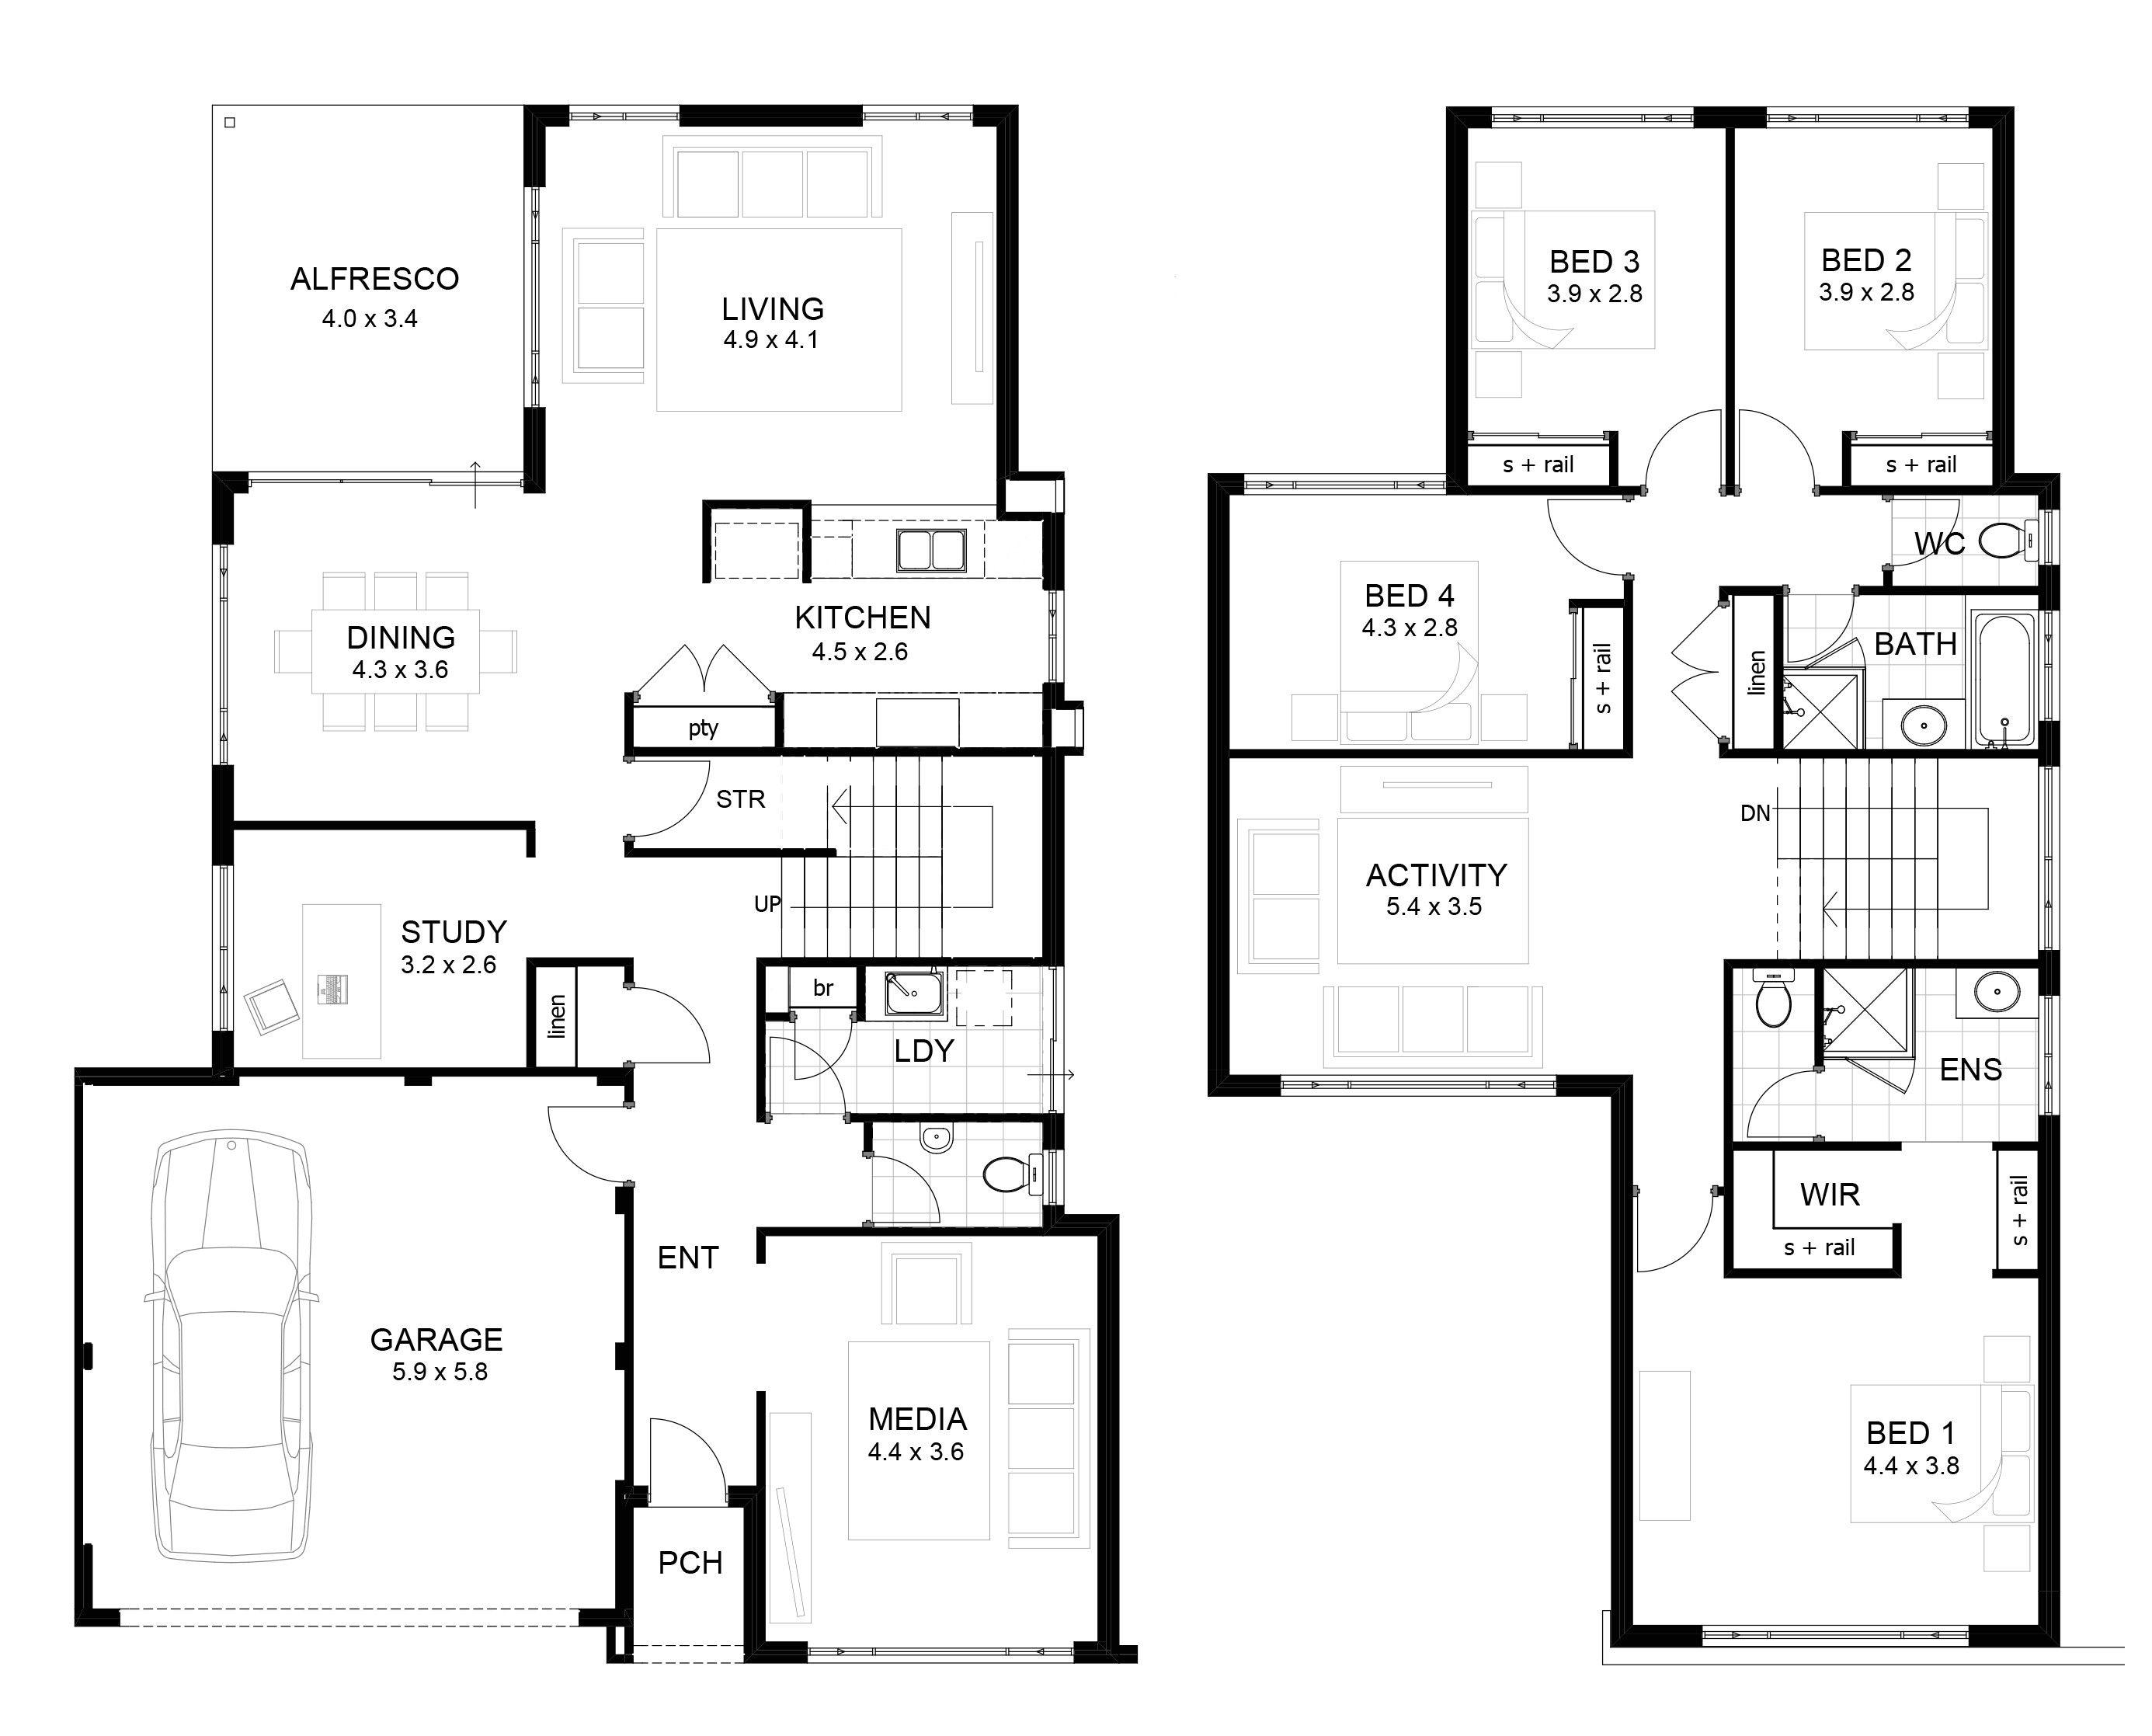 Two Storey House Floor Plan Homes Floor Plans In 2020 Double Storey House Plans Two Storey House Plans House Plans Australia